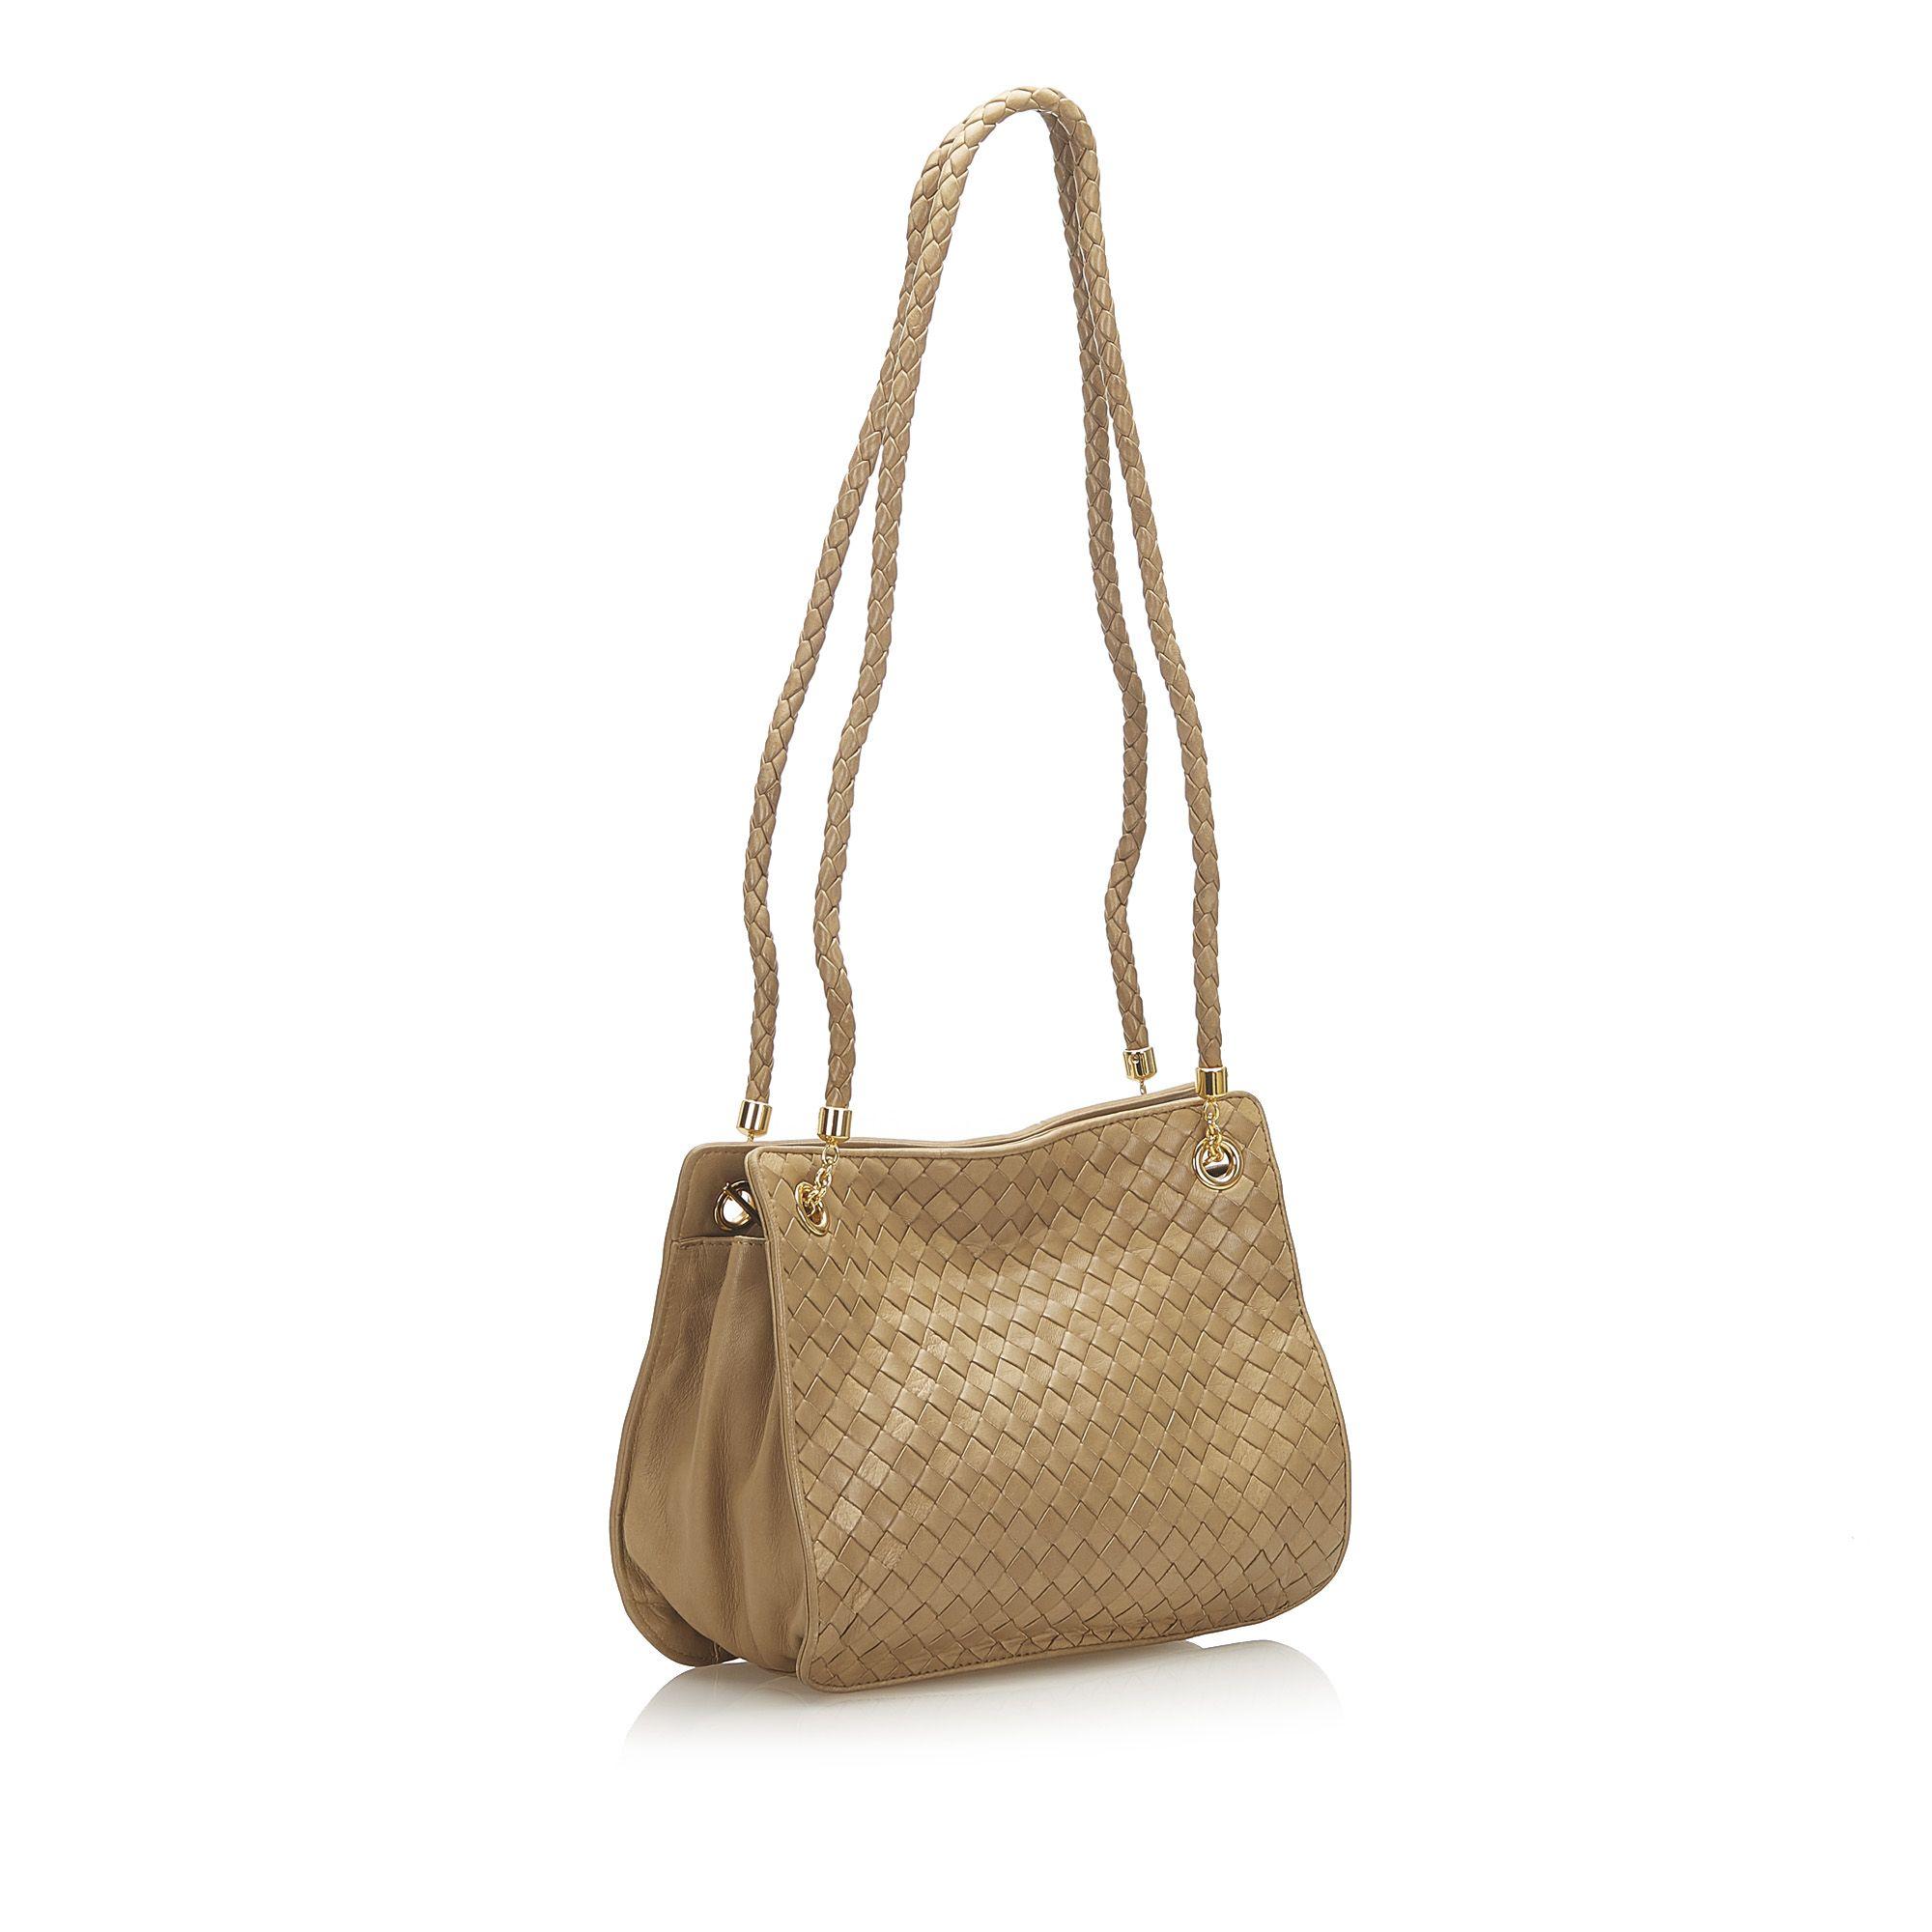 Vintage Bottega Veneta Intrecciato Leather Shoulder Bag Brown